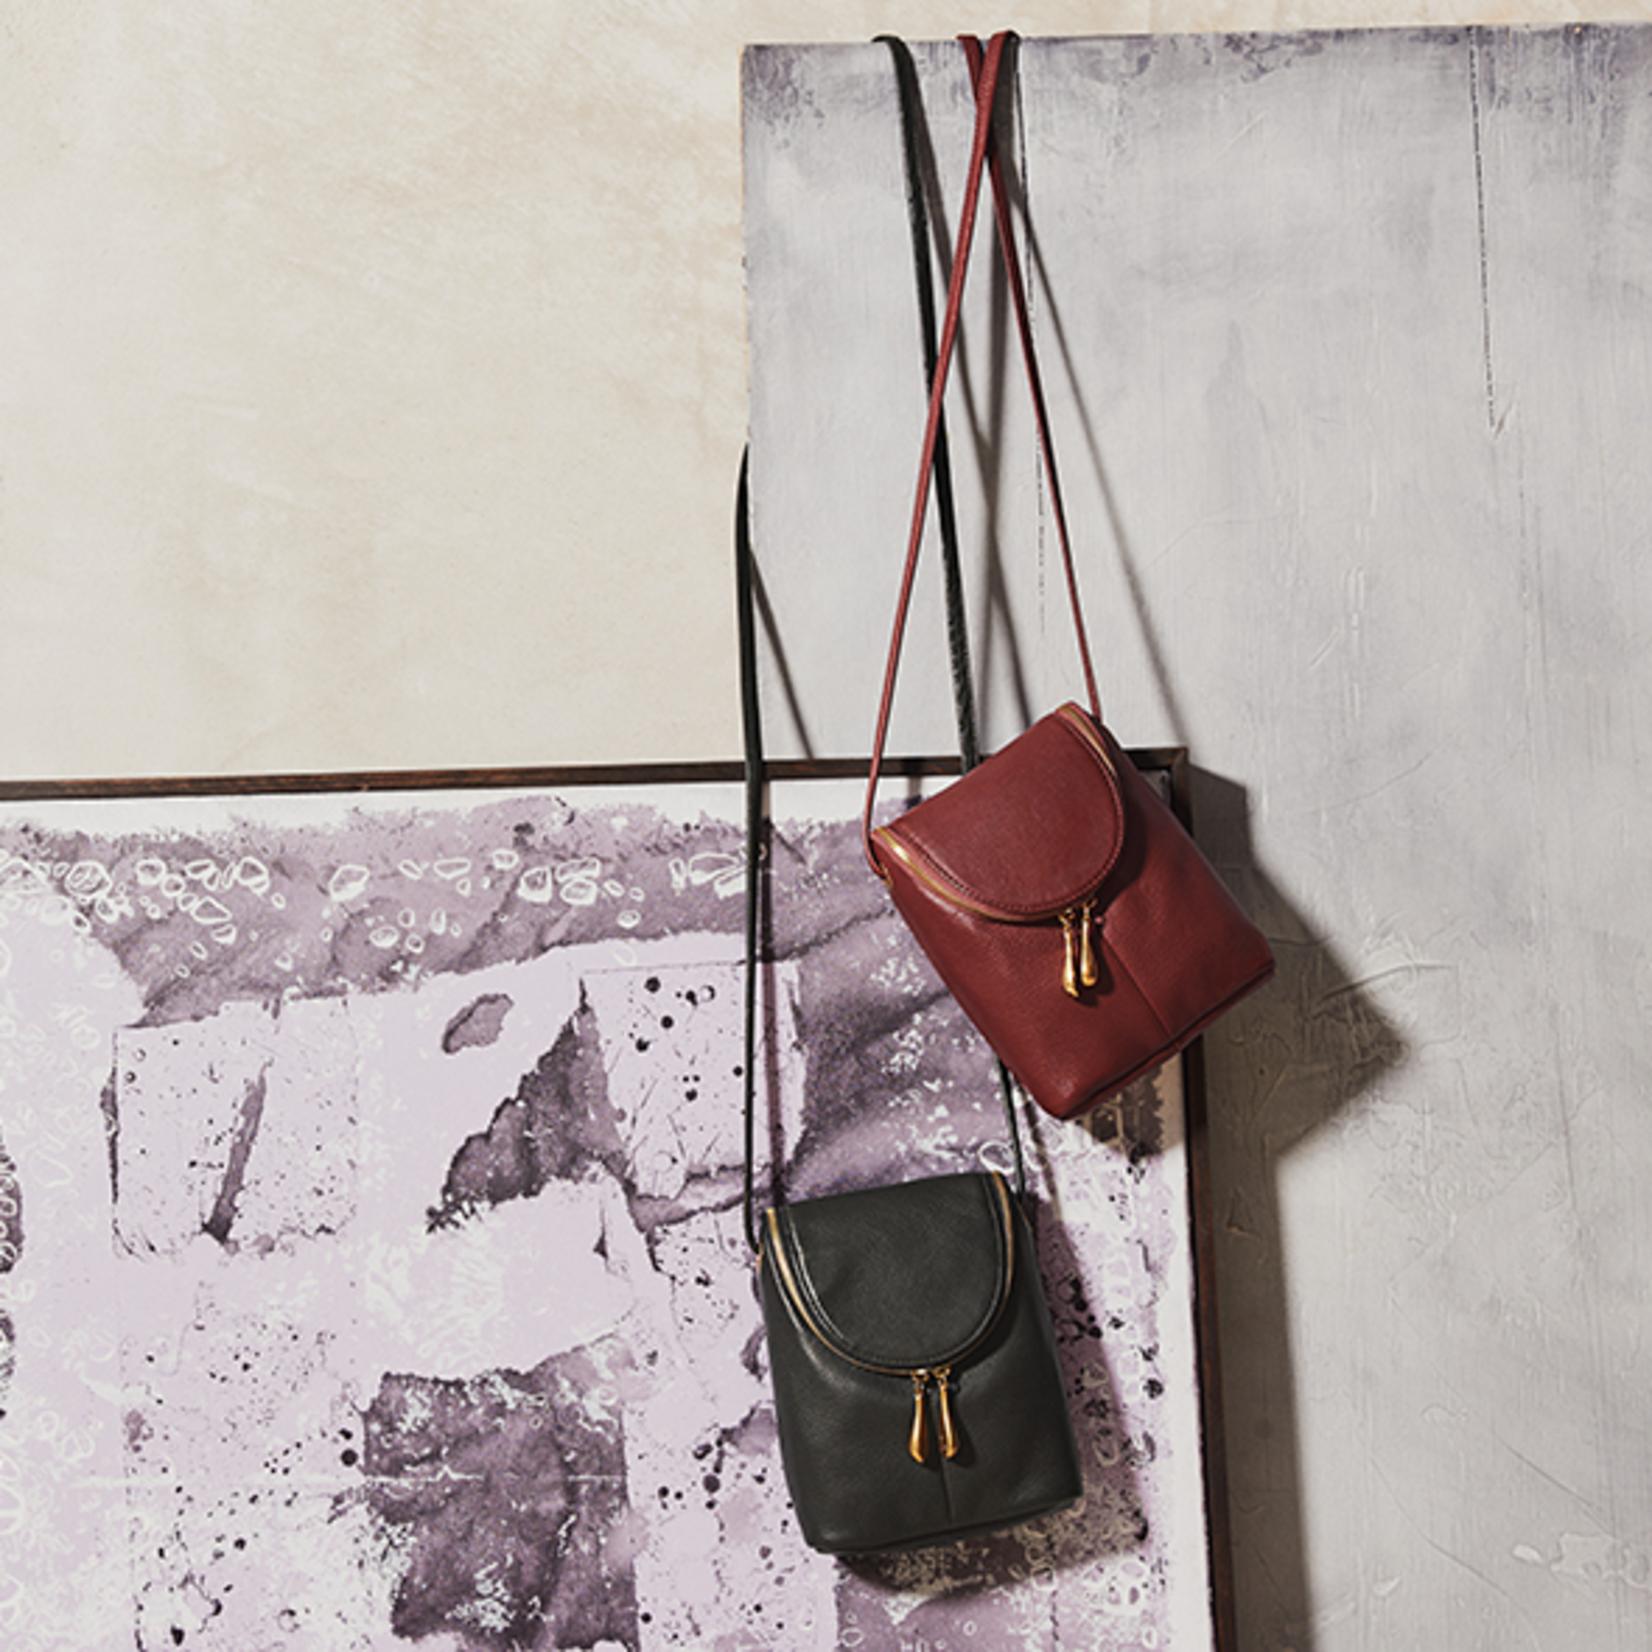 HOBO Fern Port Vintage Hide Leather Crossbody